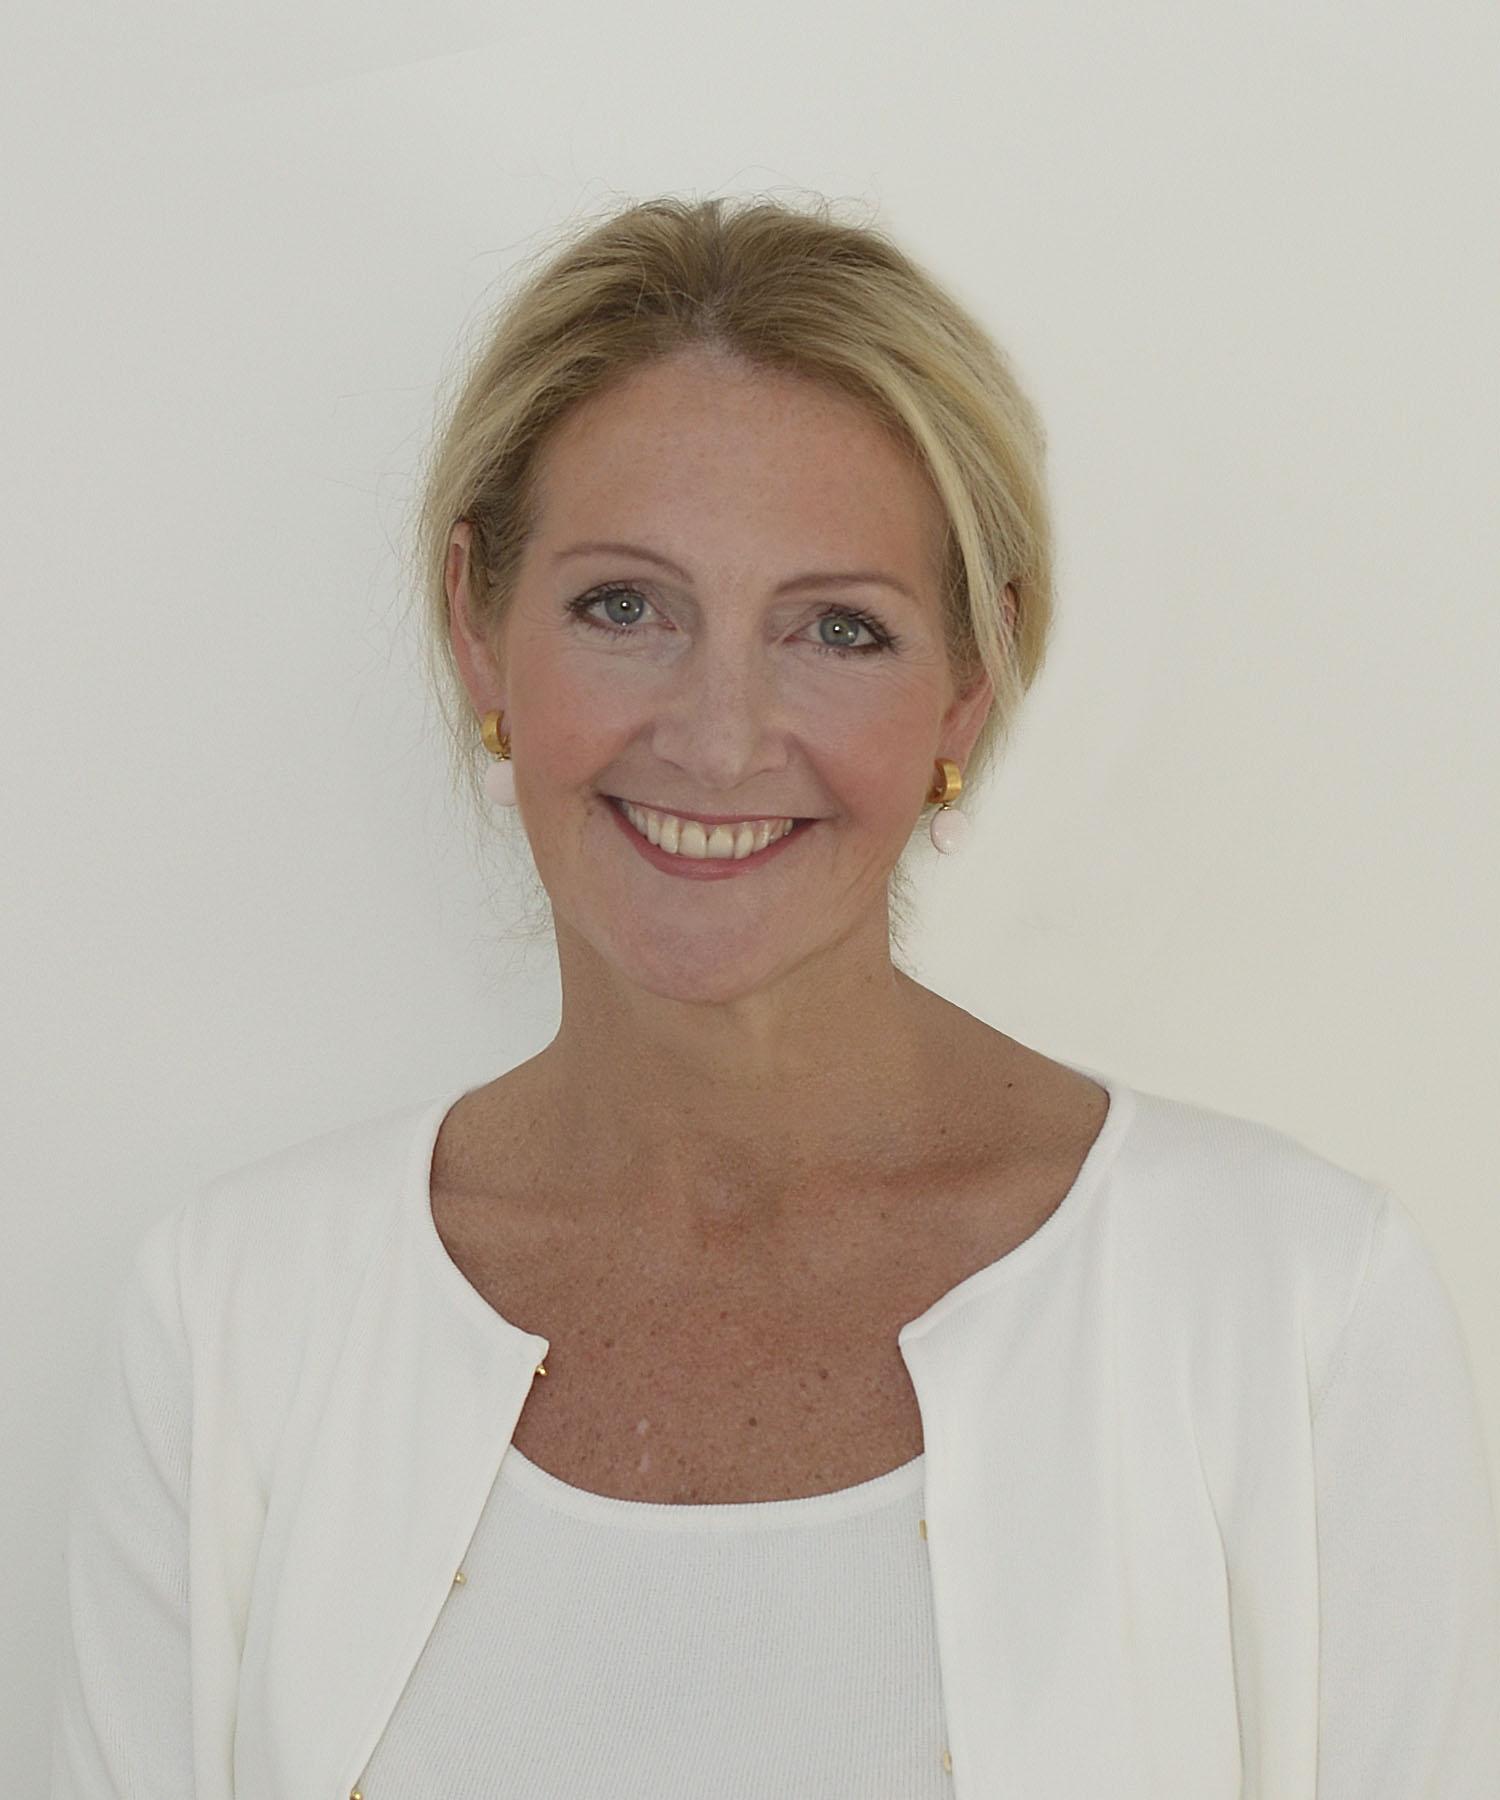 Monika Vilu